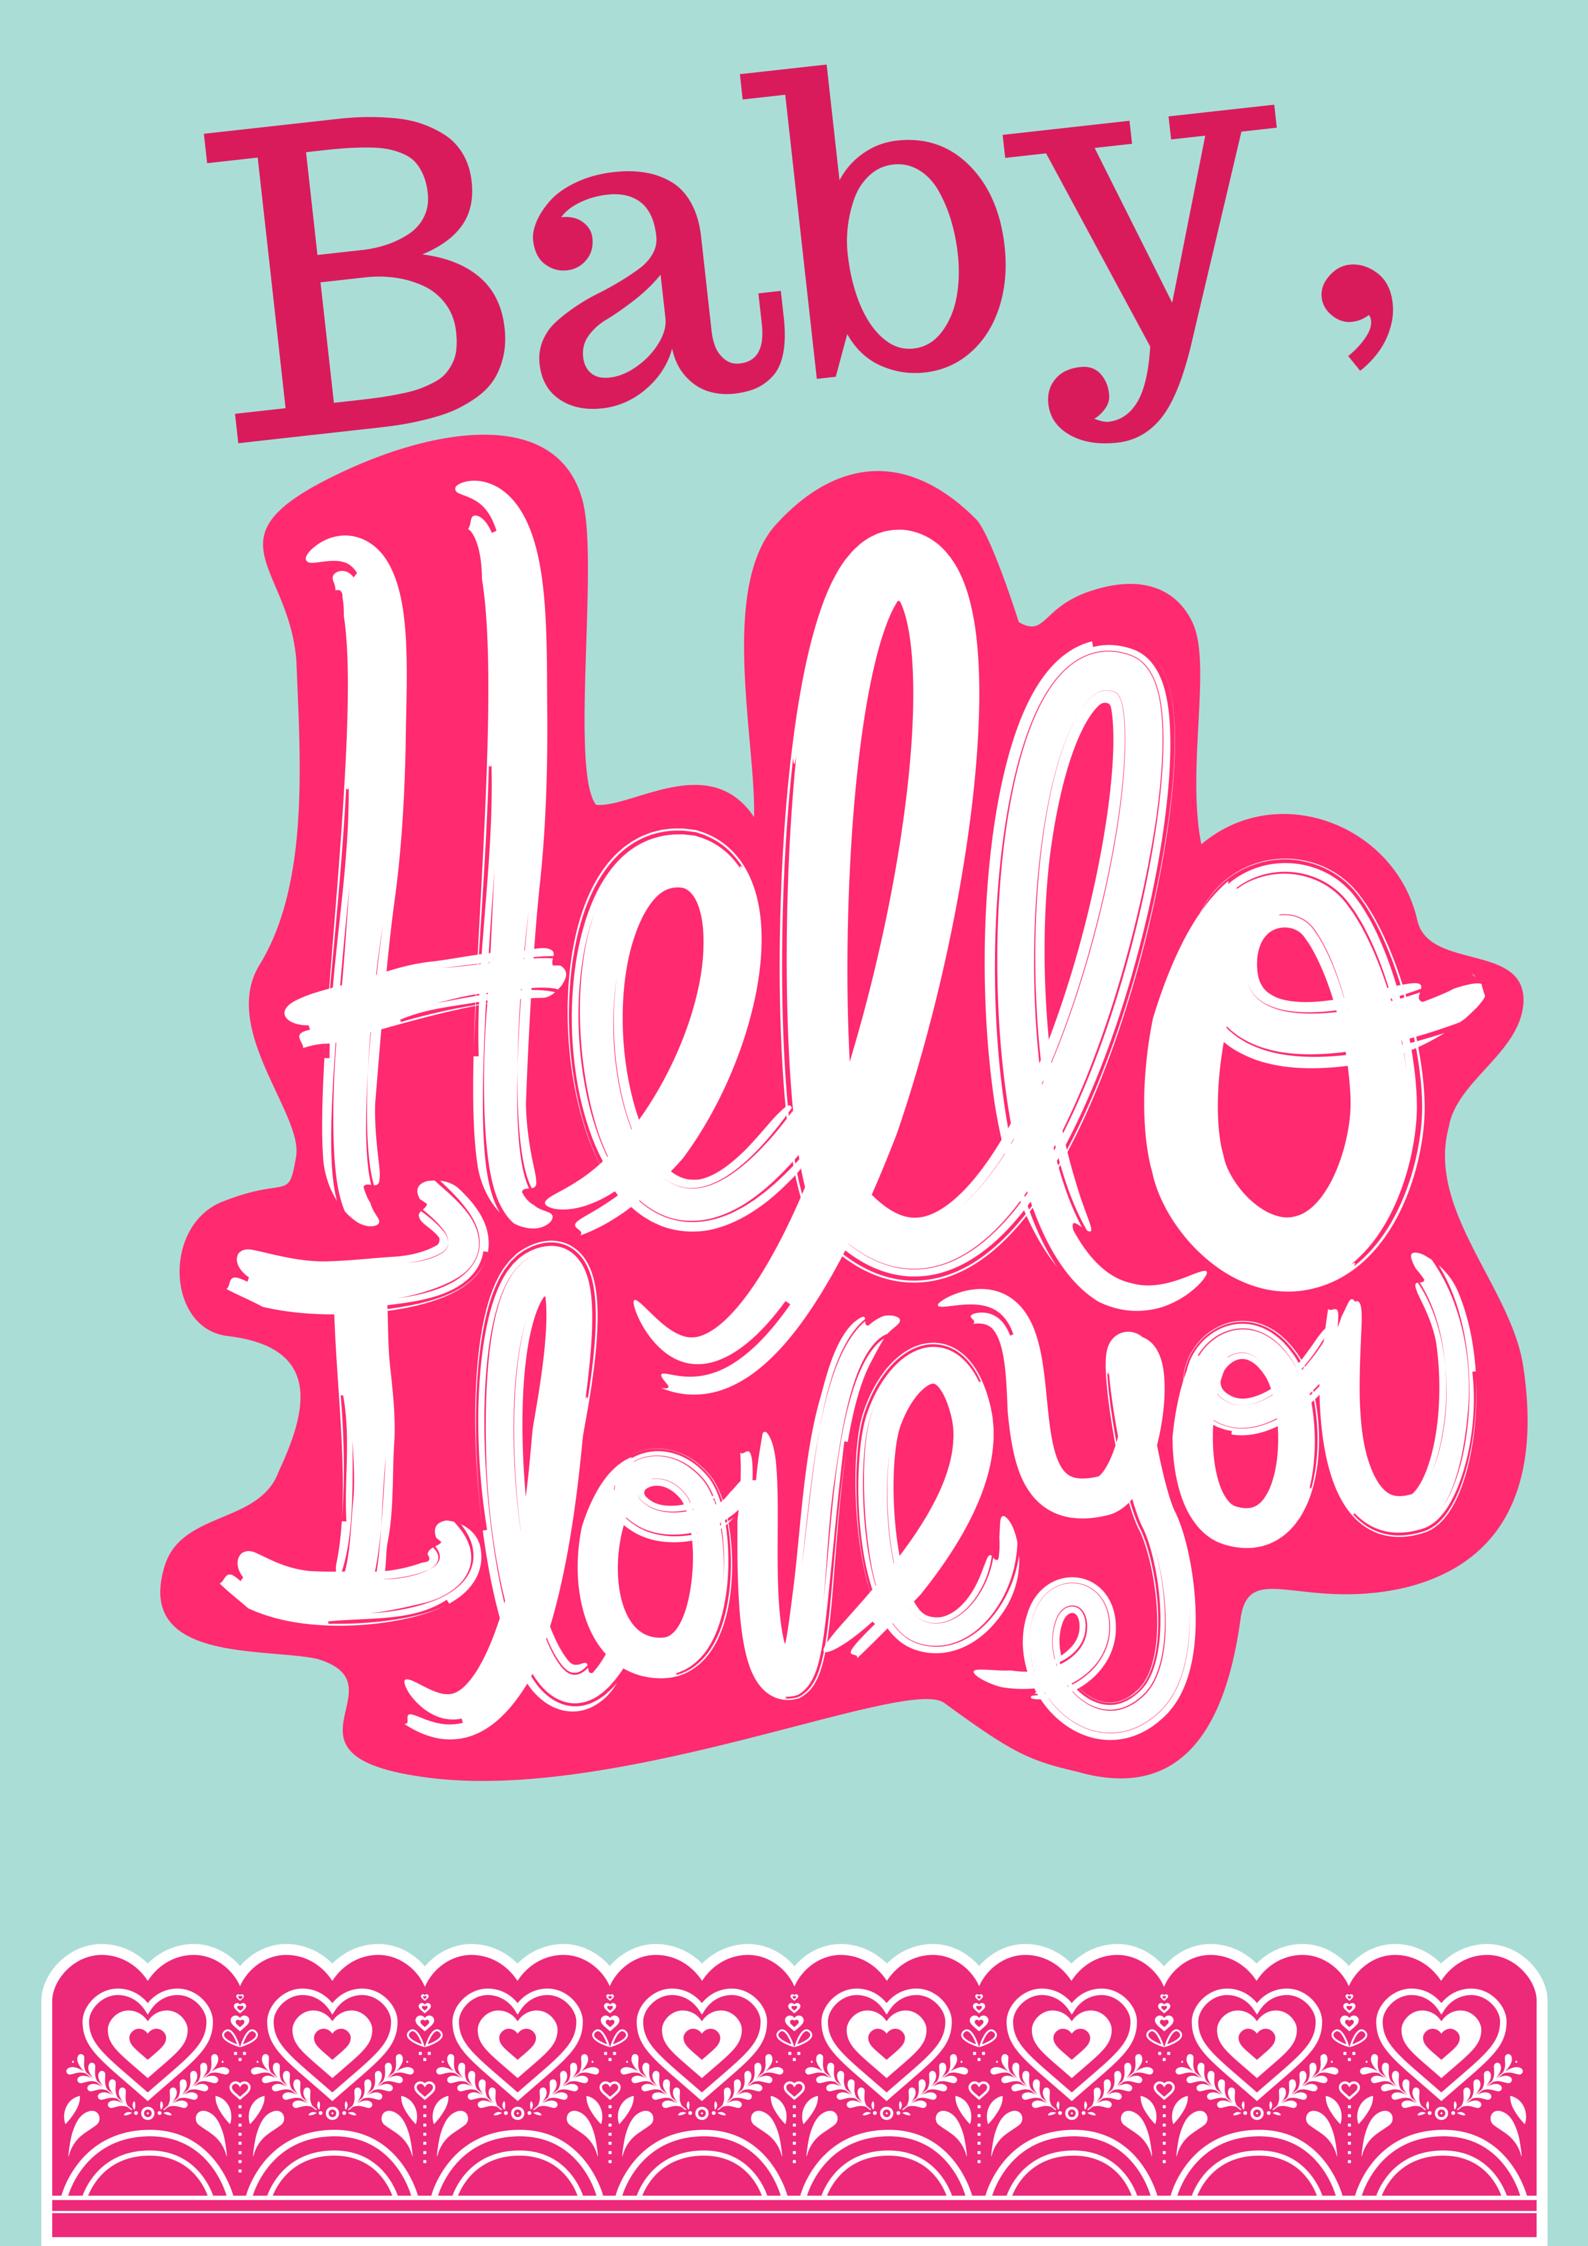 Baby, Hello I Love You!